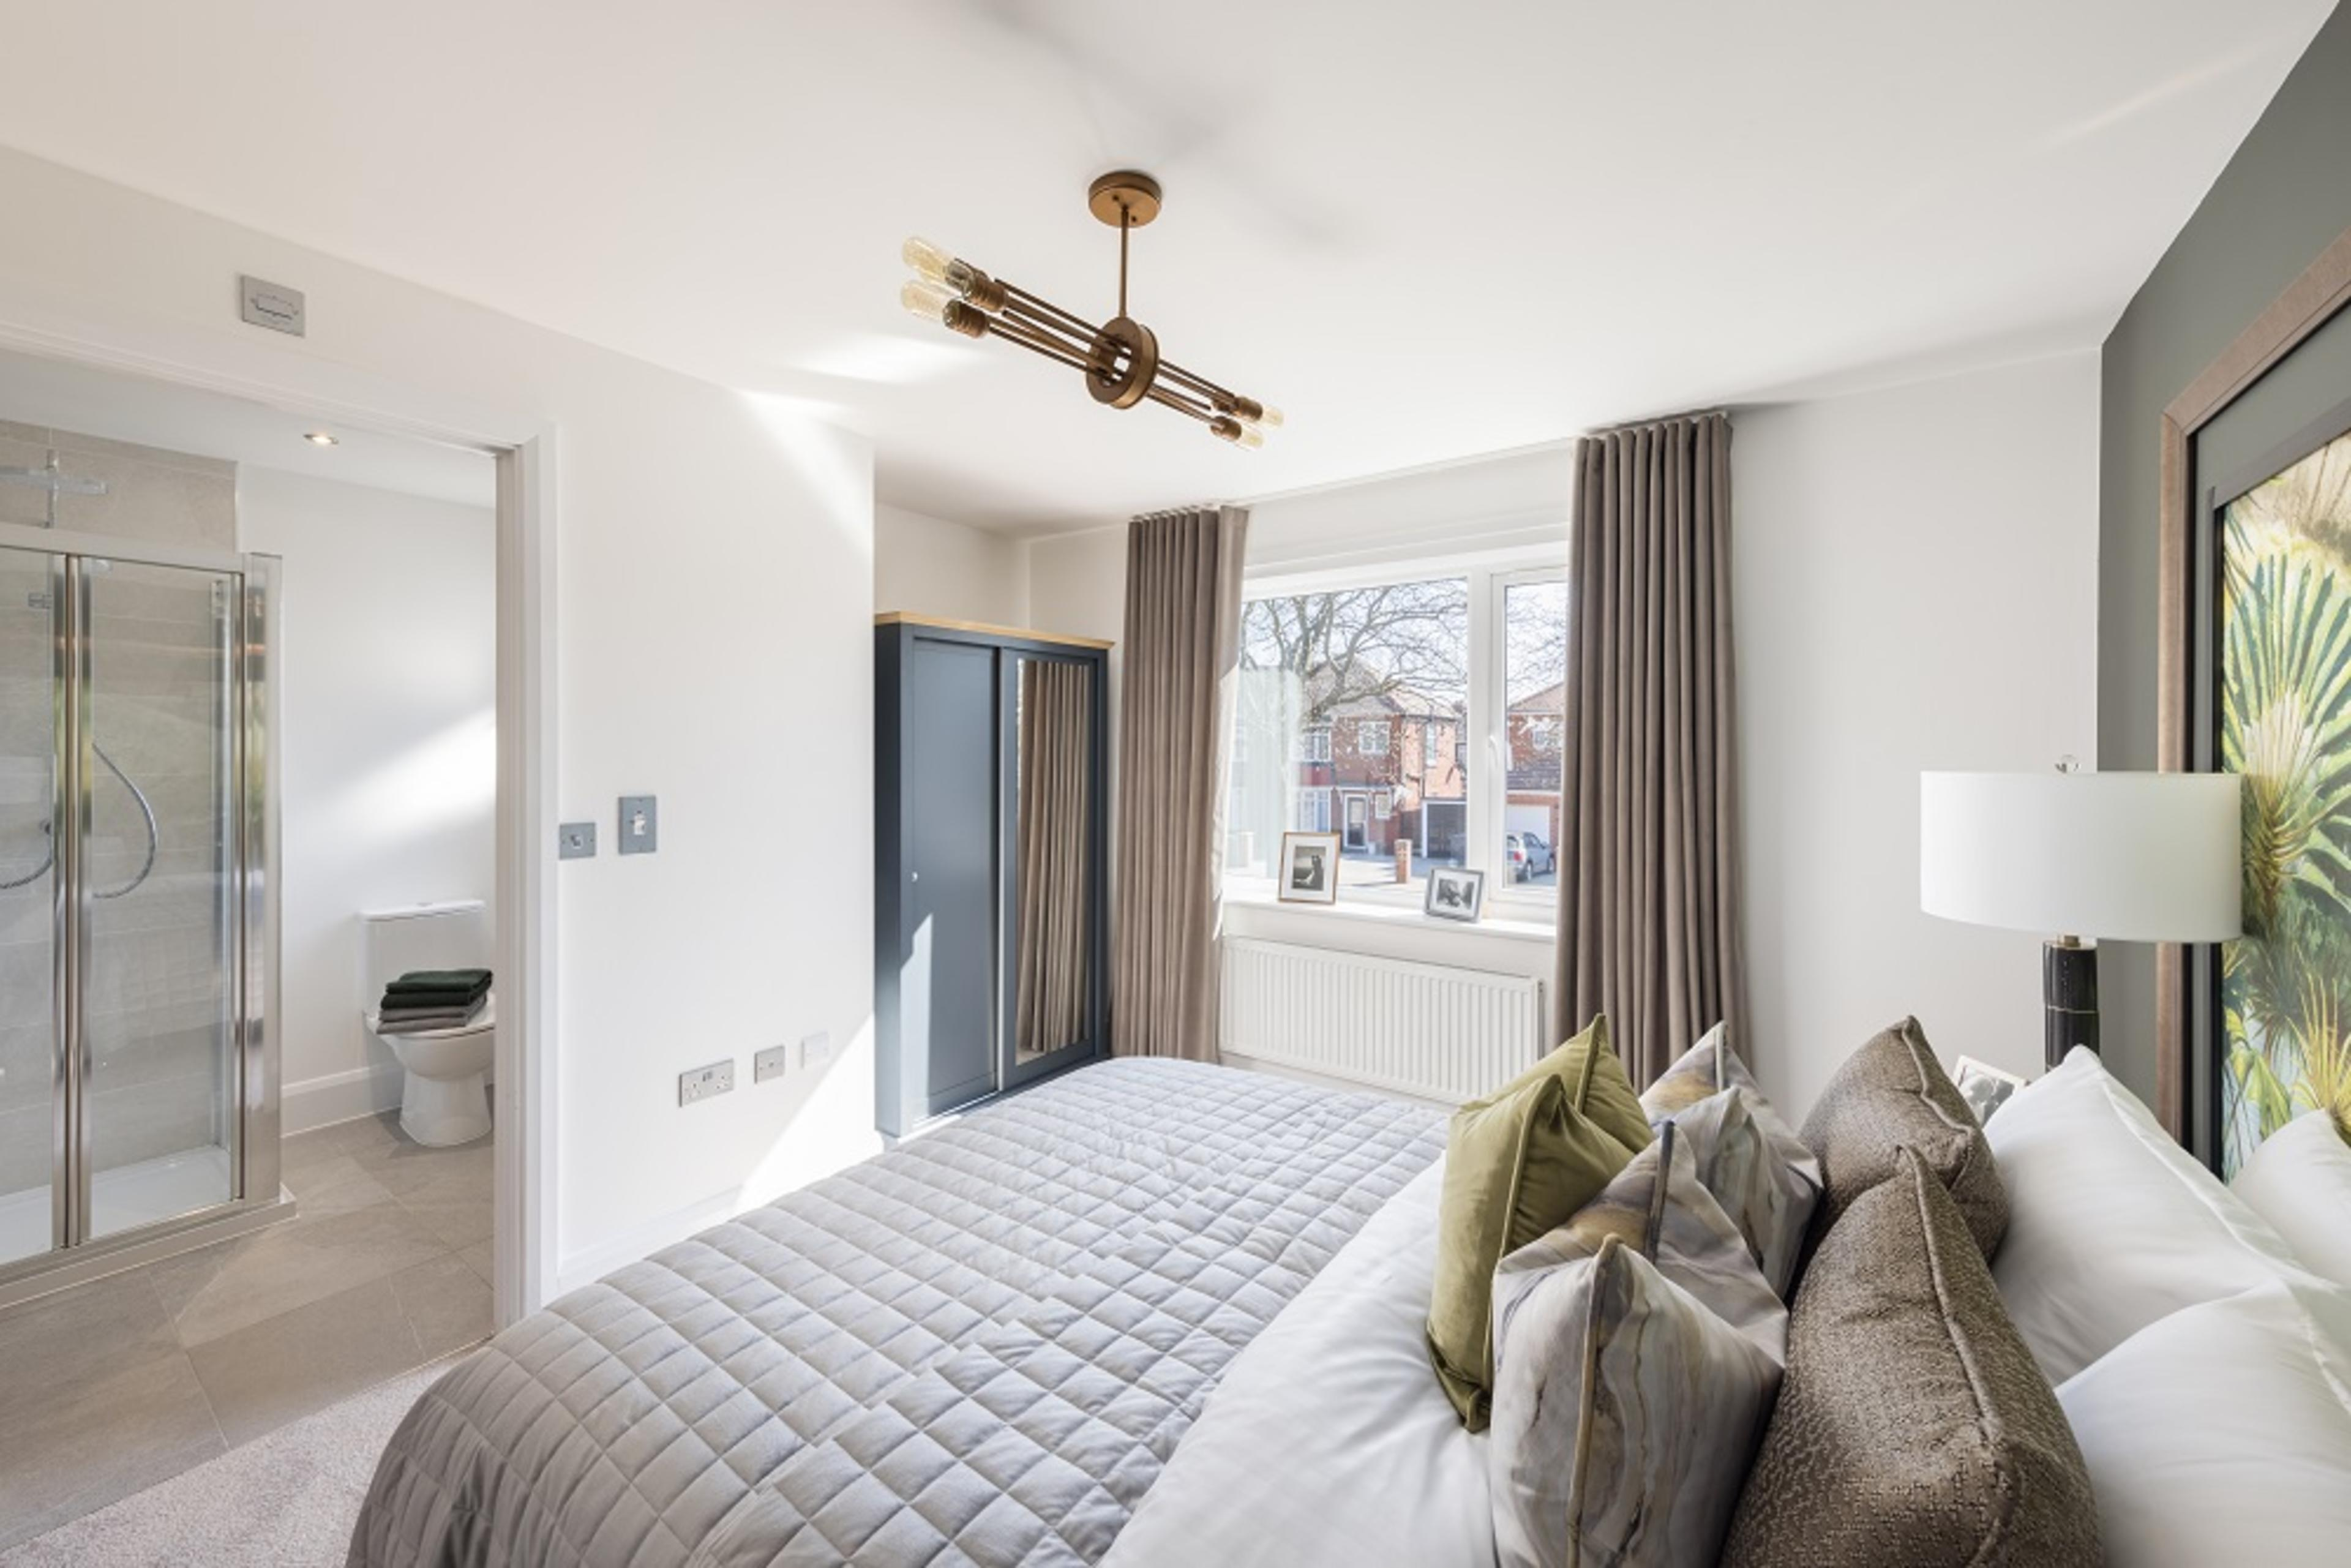 woolner-brook-hector-master-bedroom